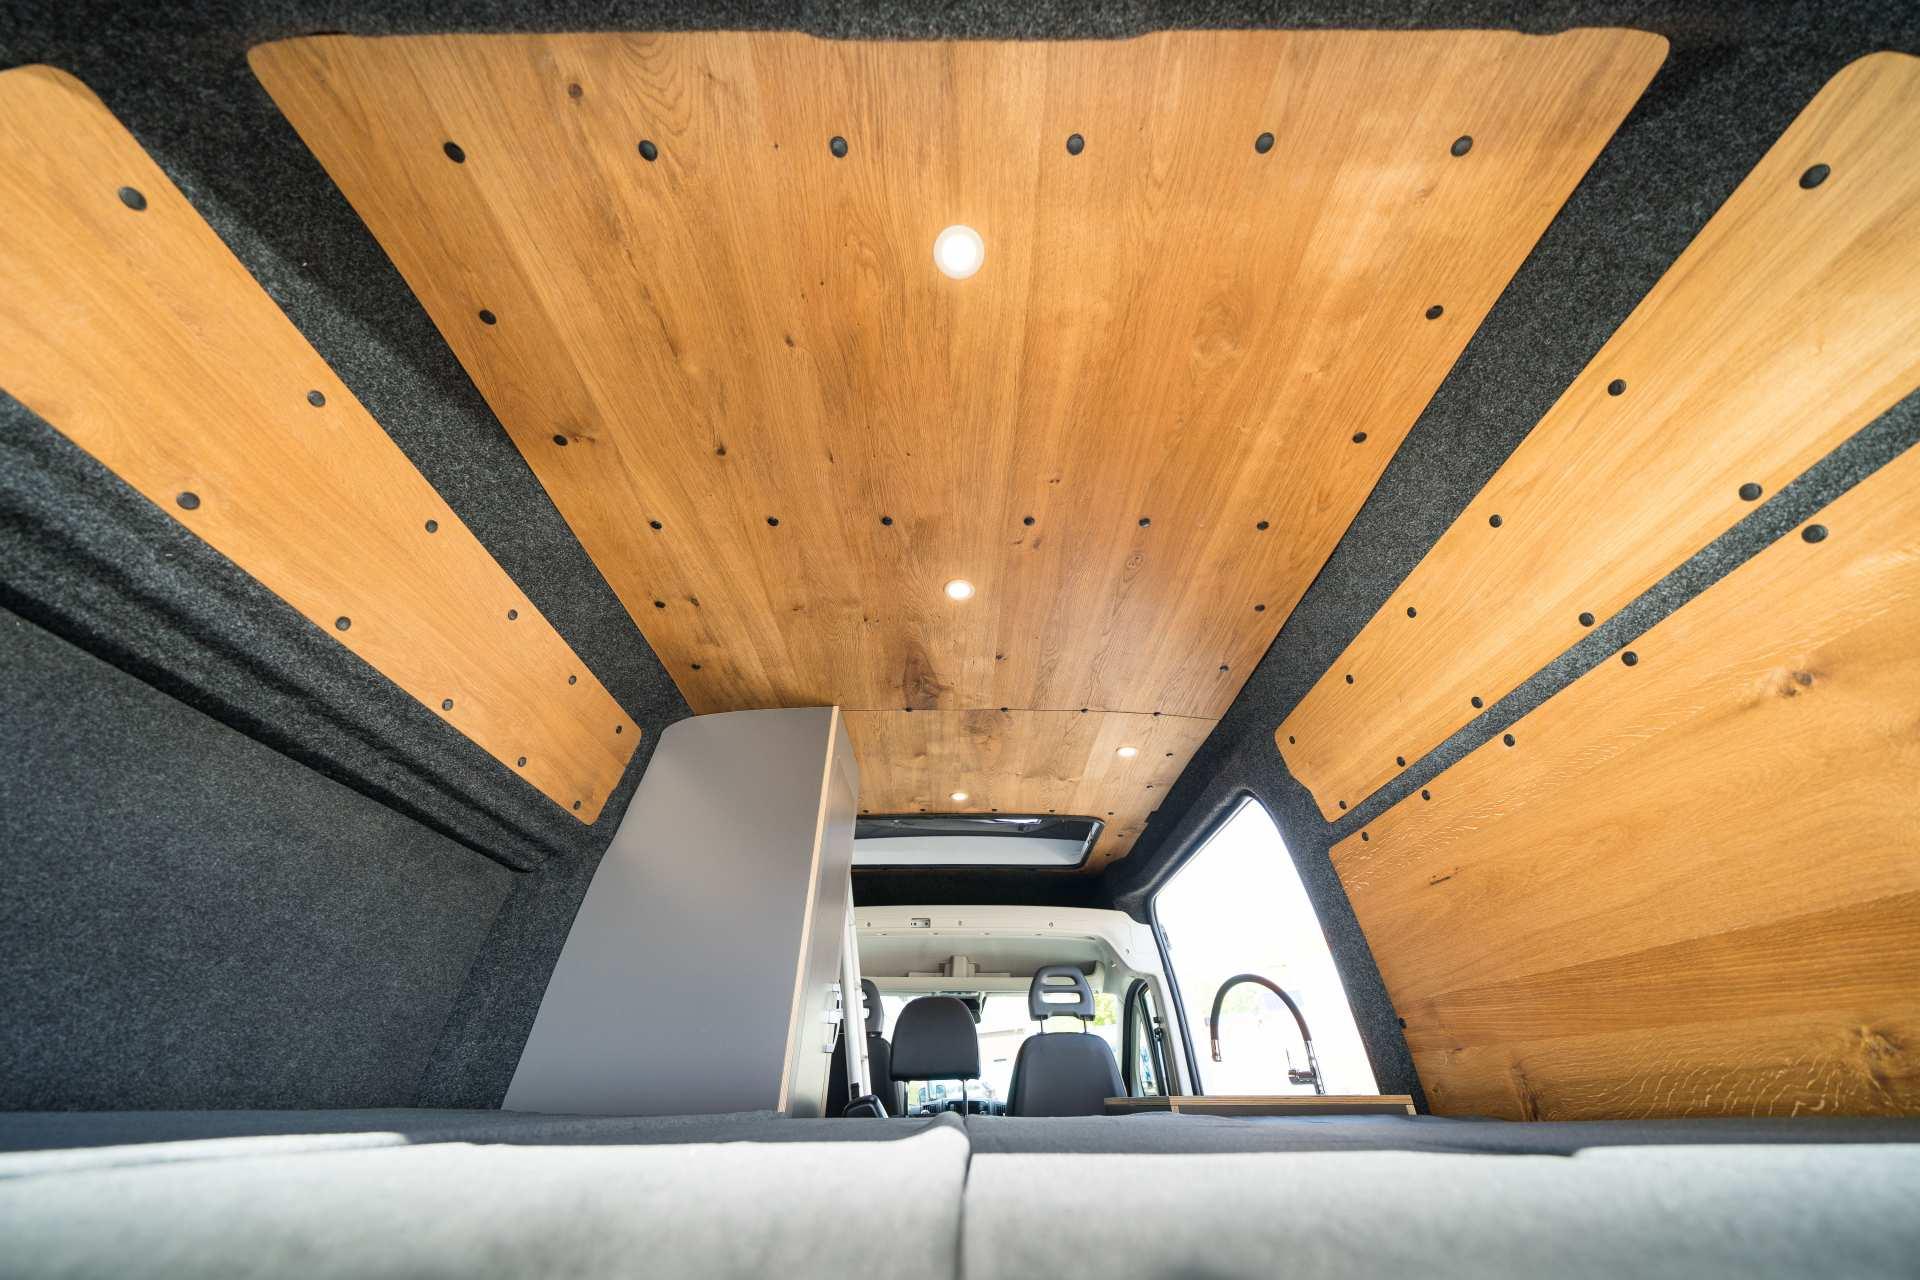 Individualausbau: Zwei-Raumwohnung Peugeot Boxer L2 H2 - 41